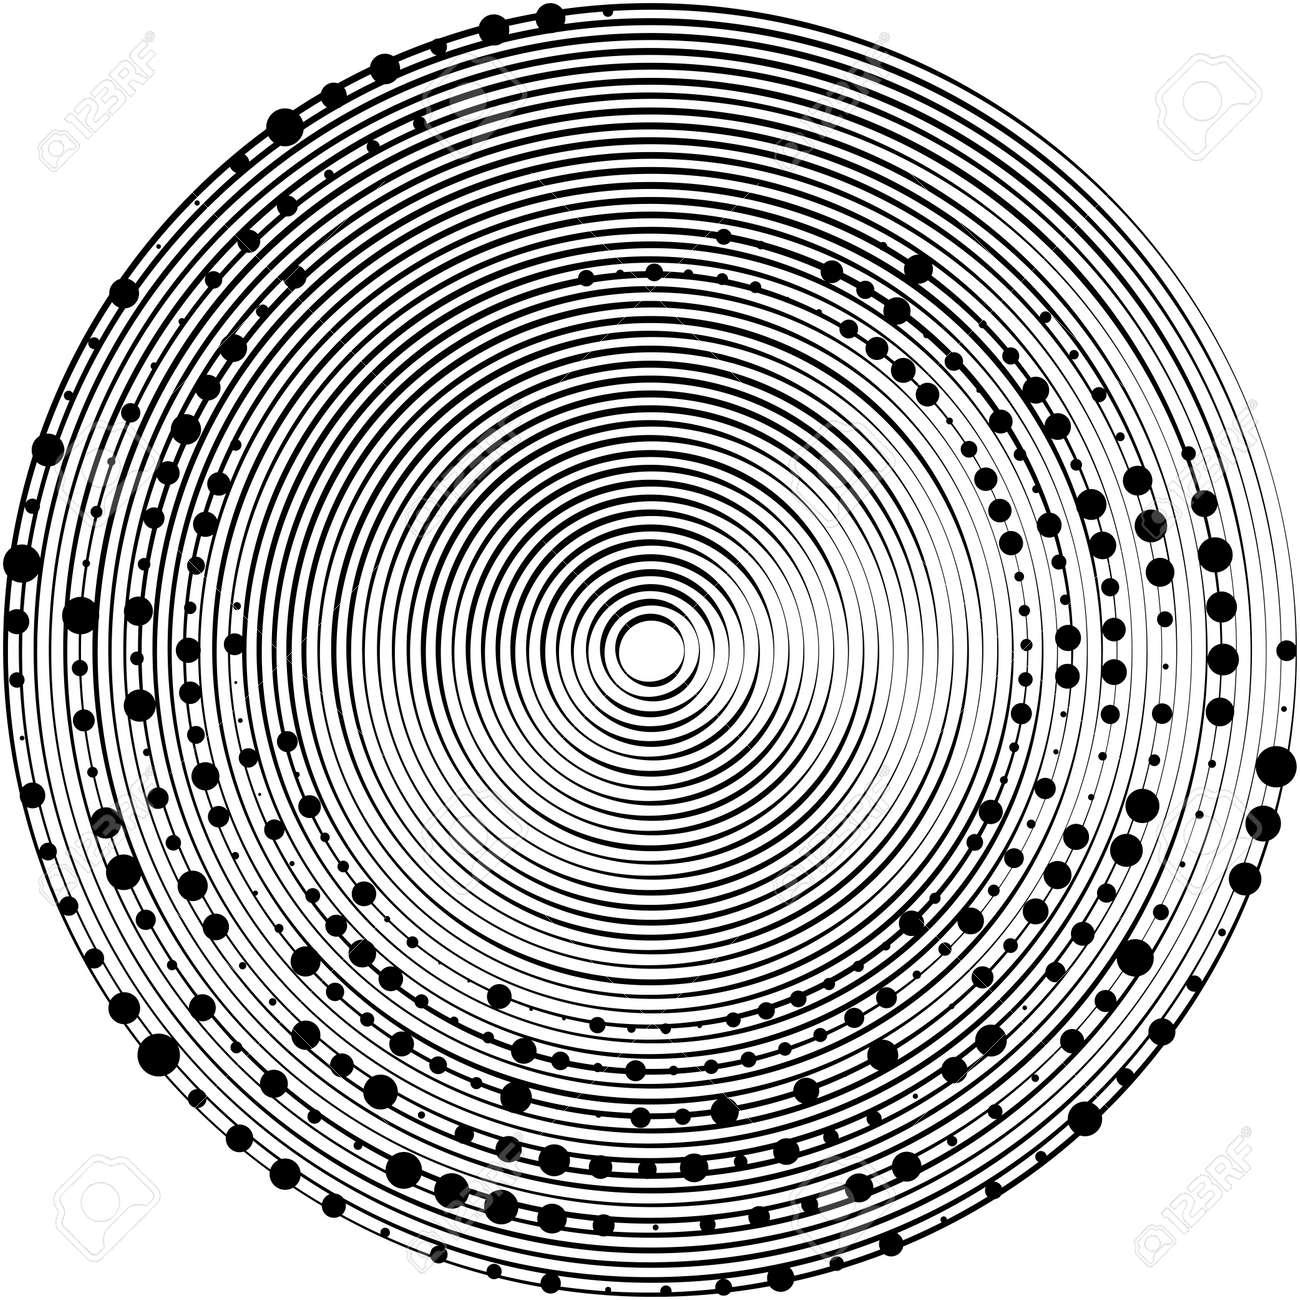 Overlaying abstract Spiral, Swirl, Twirl vector. Volute, helix, cochlear vertigo circular, geometric illustration. Abstract circle - 168027354